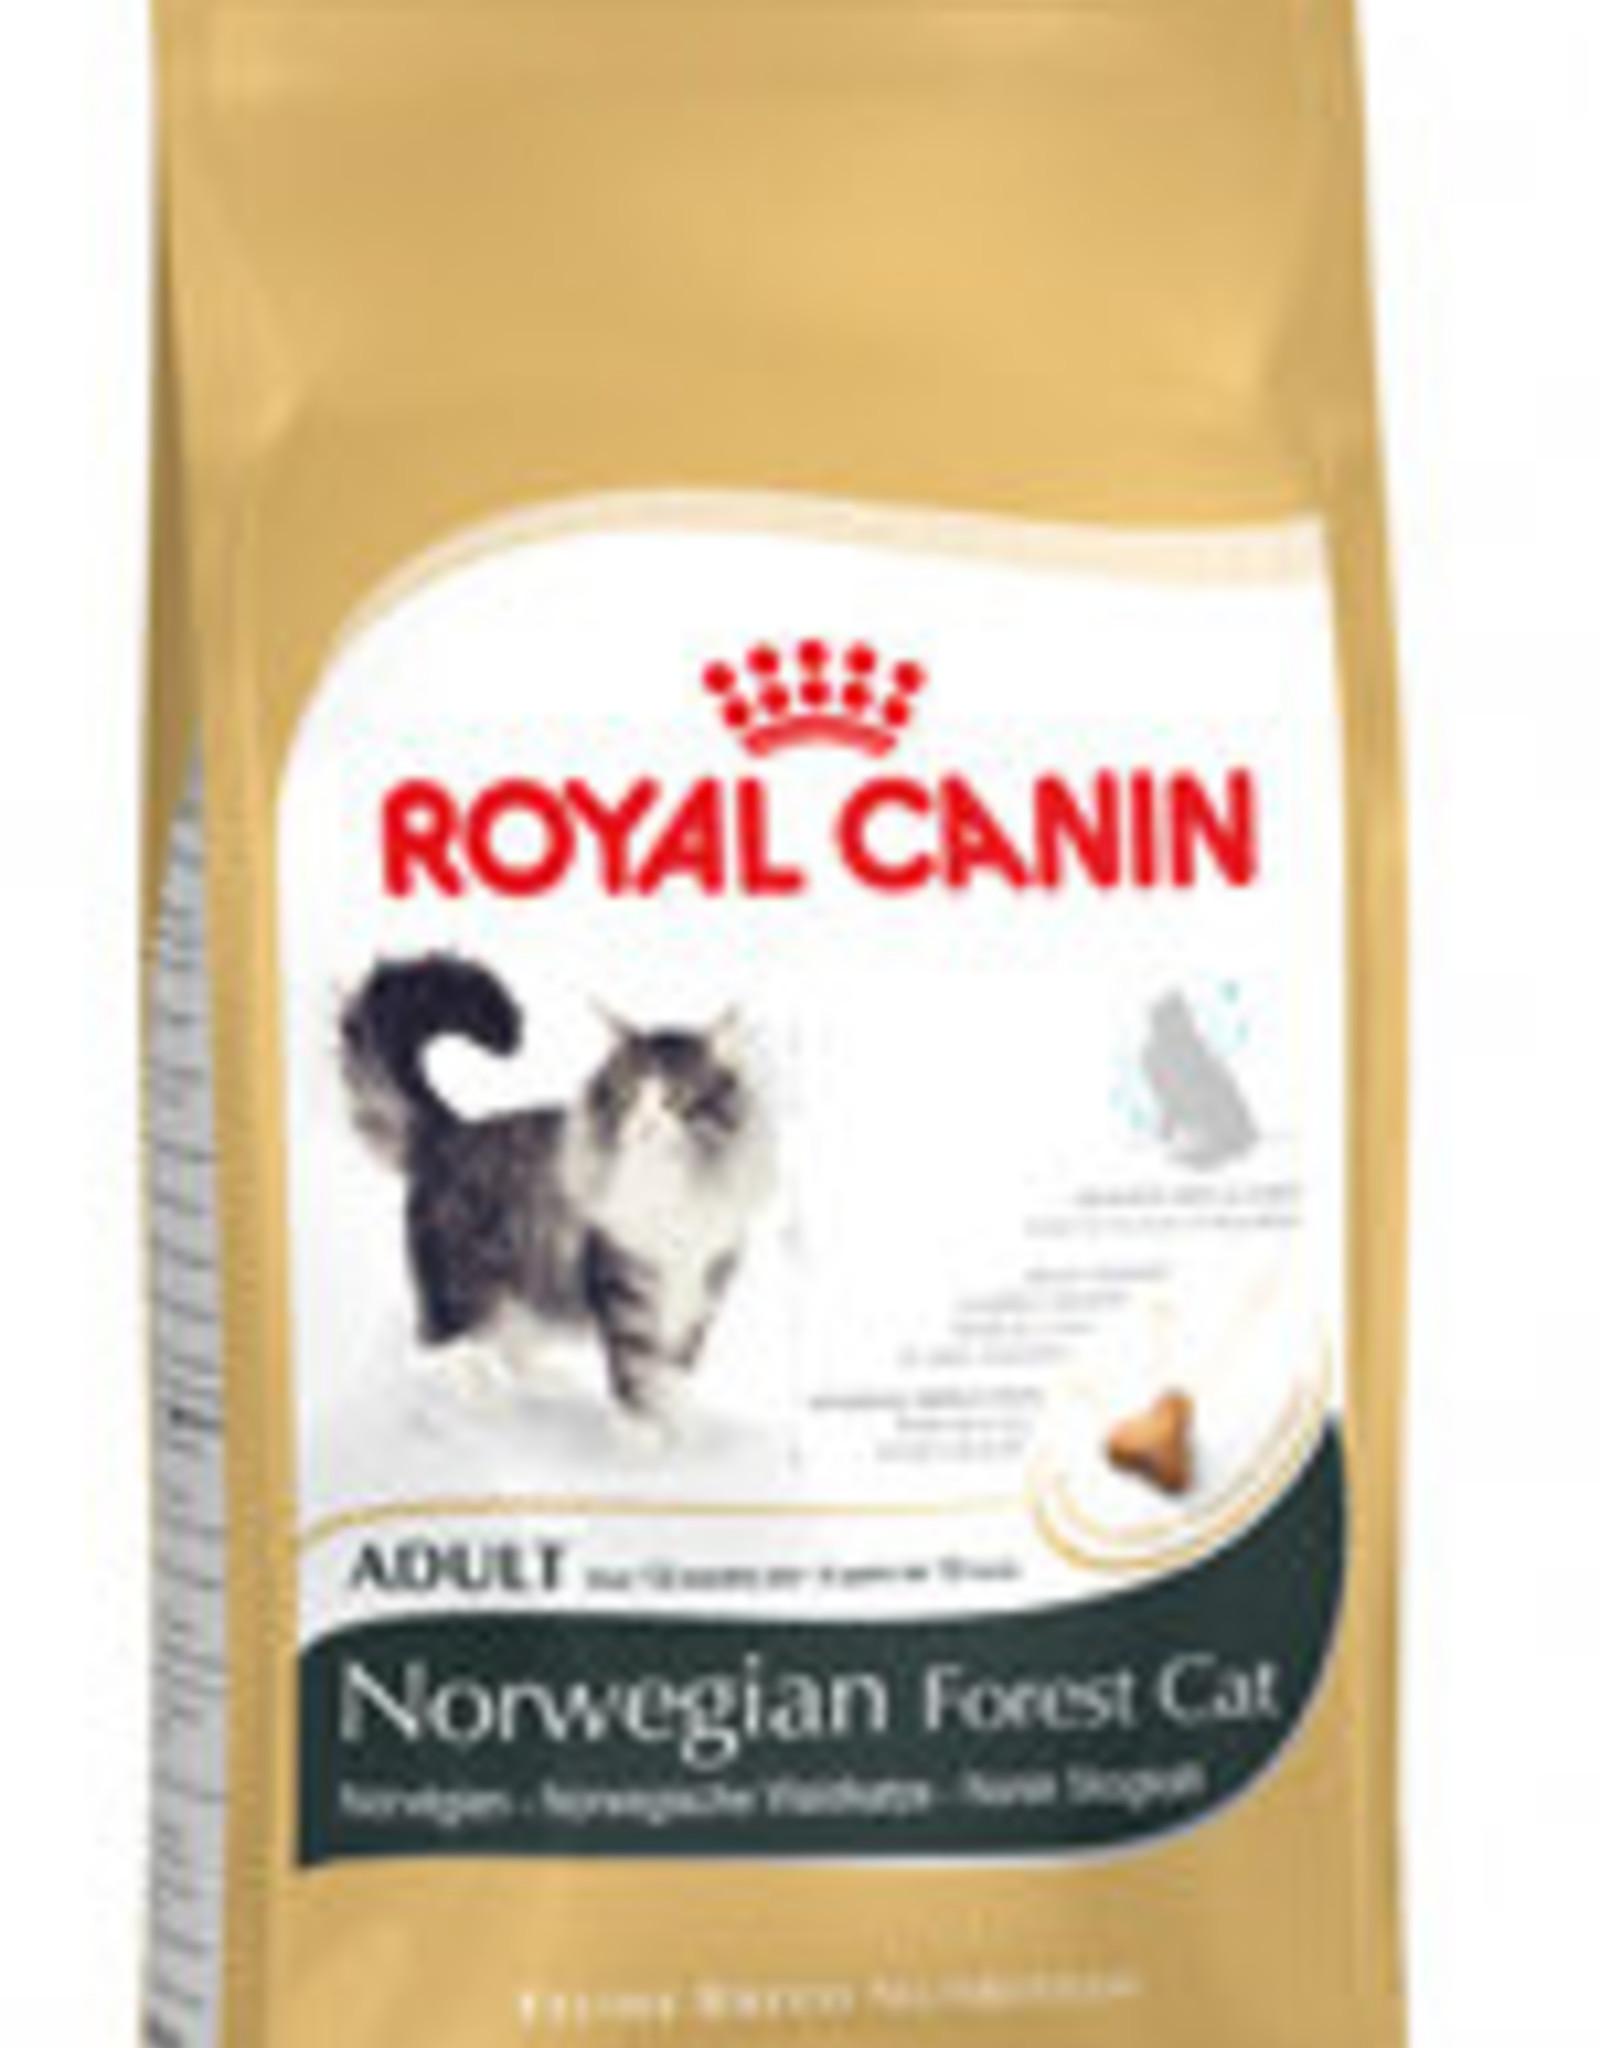 Royal Canin Royal Canin Fbn Norwegian Forest 10kg